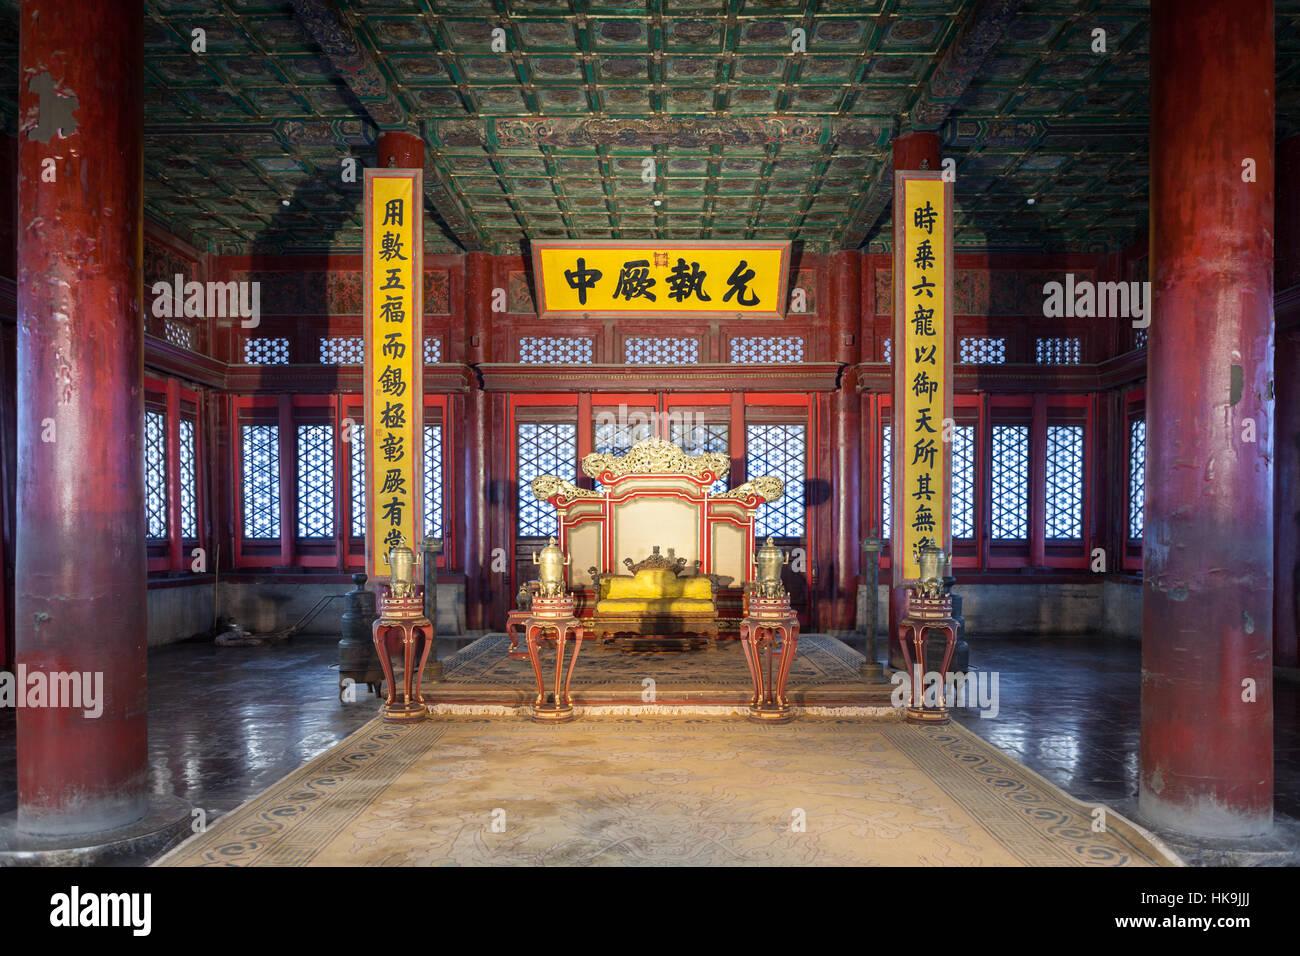 Hall of Central Harmony (Hall of Complete Harmony). Forbidden City, Beijing, China - Stock Image